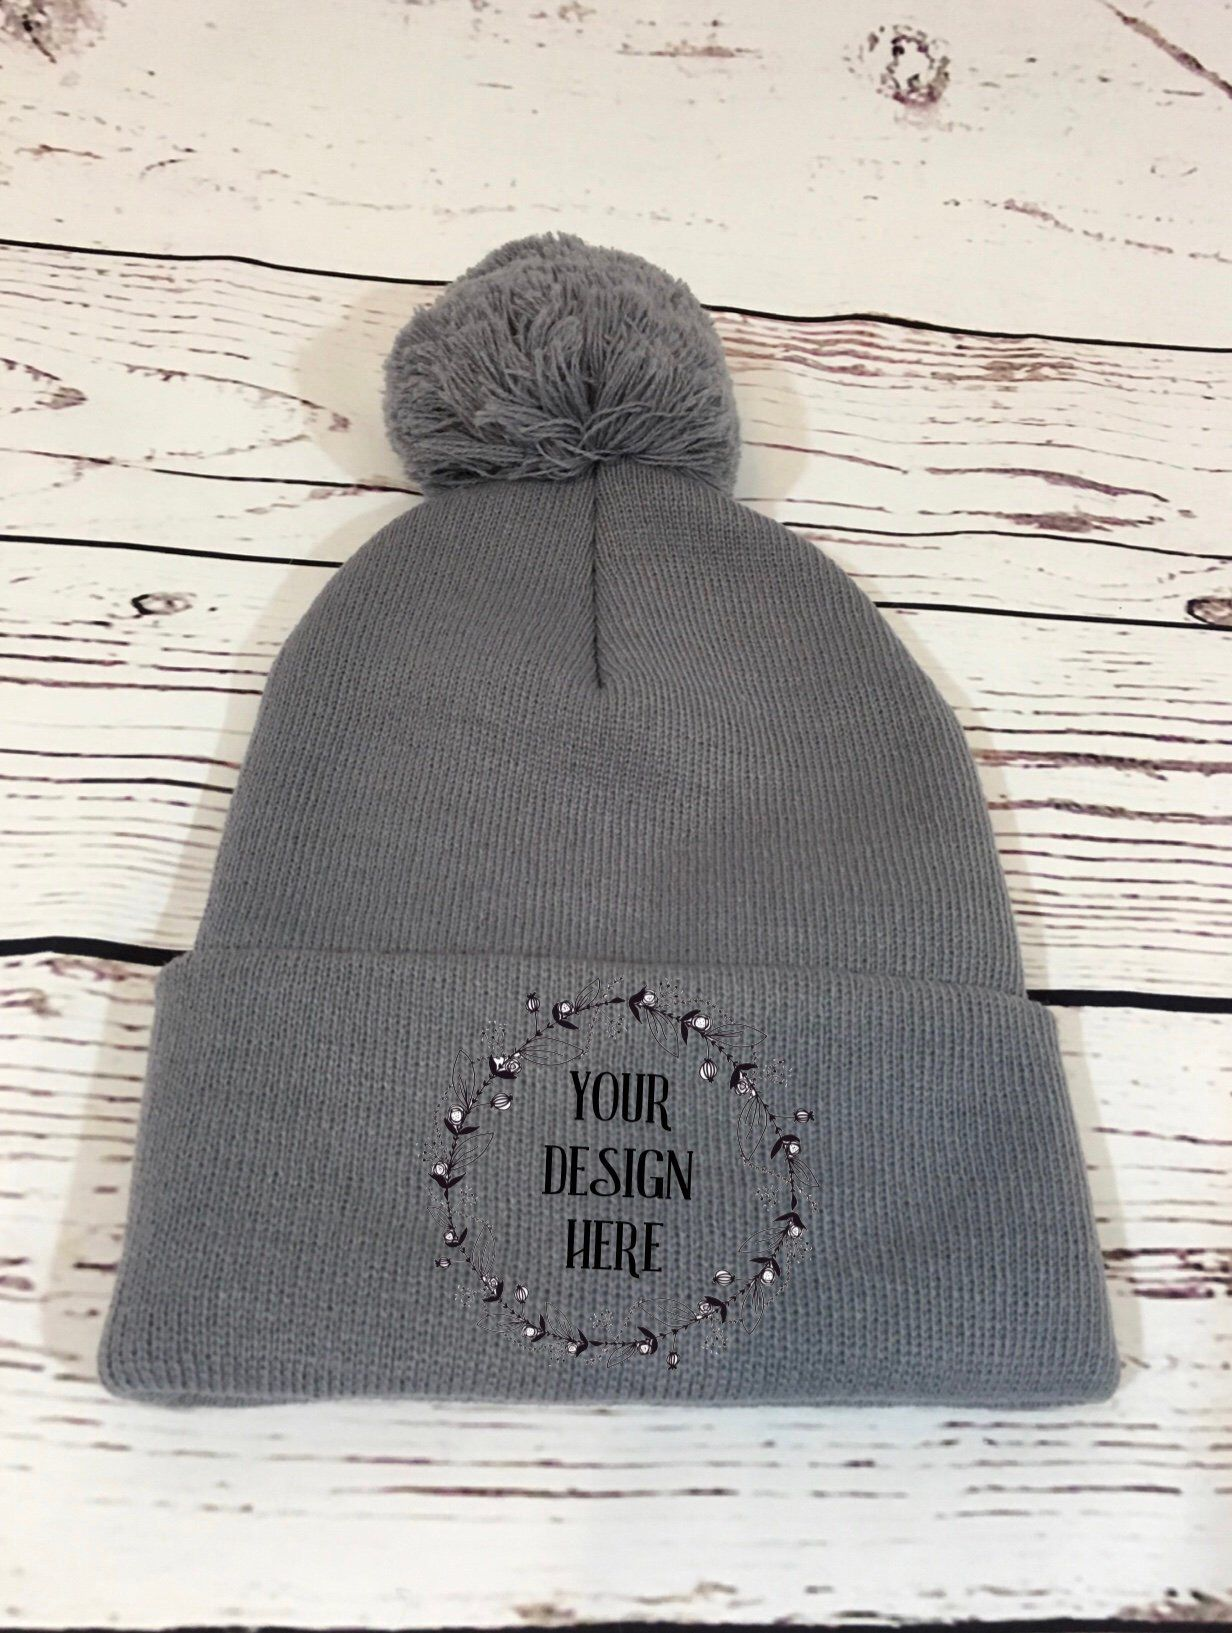 Download Grey Pom Pom Hat Mockup Grey Knit Hat Mockup Grey Hat Etsy Gray Knit Hat Pom Pom Hat Knitted Hats